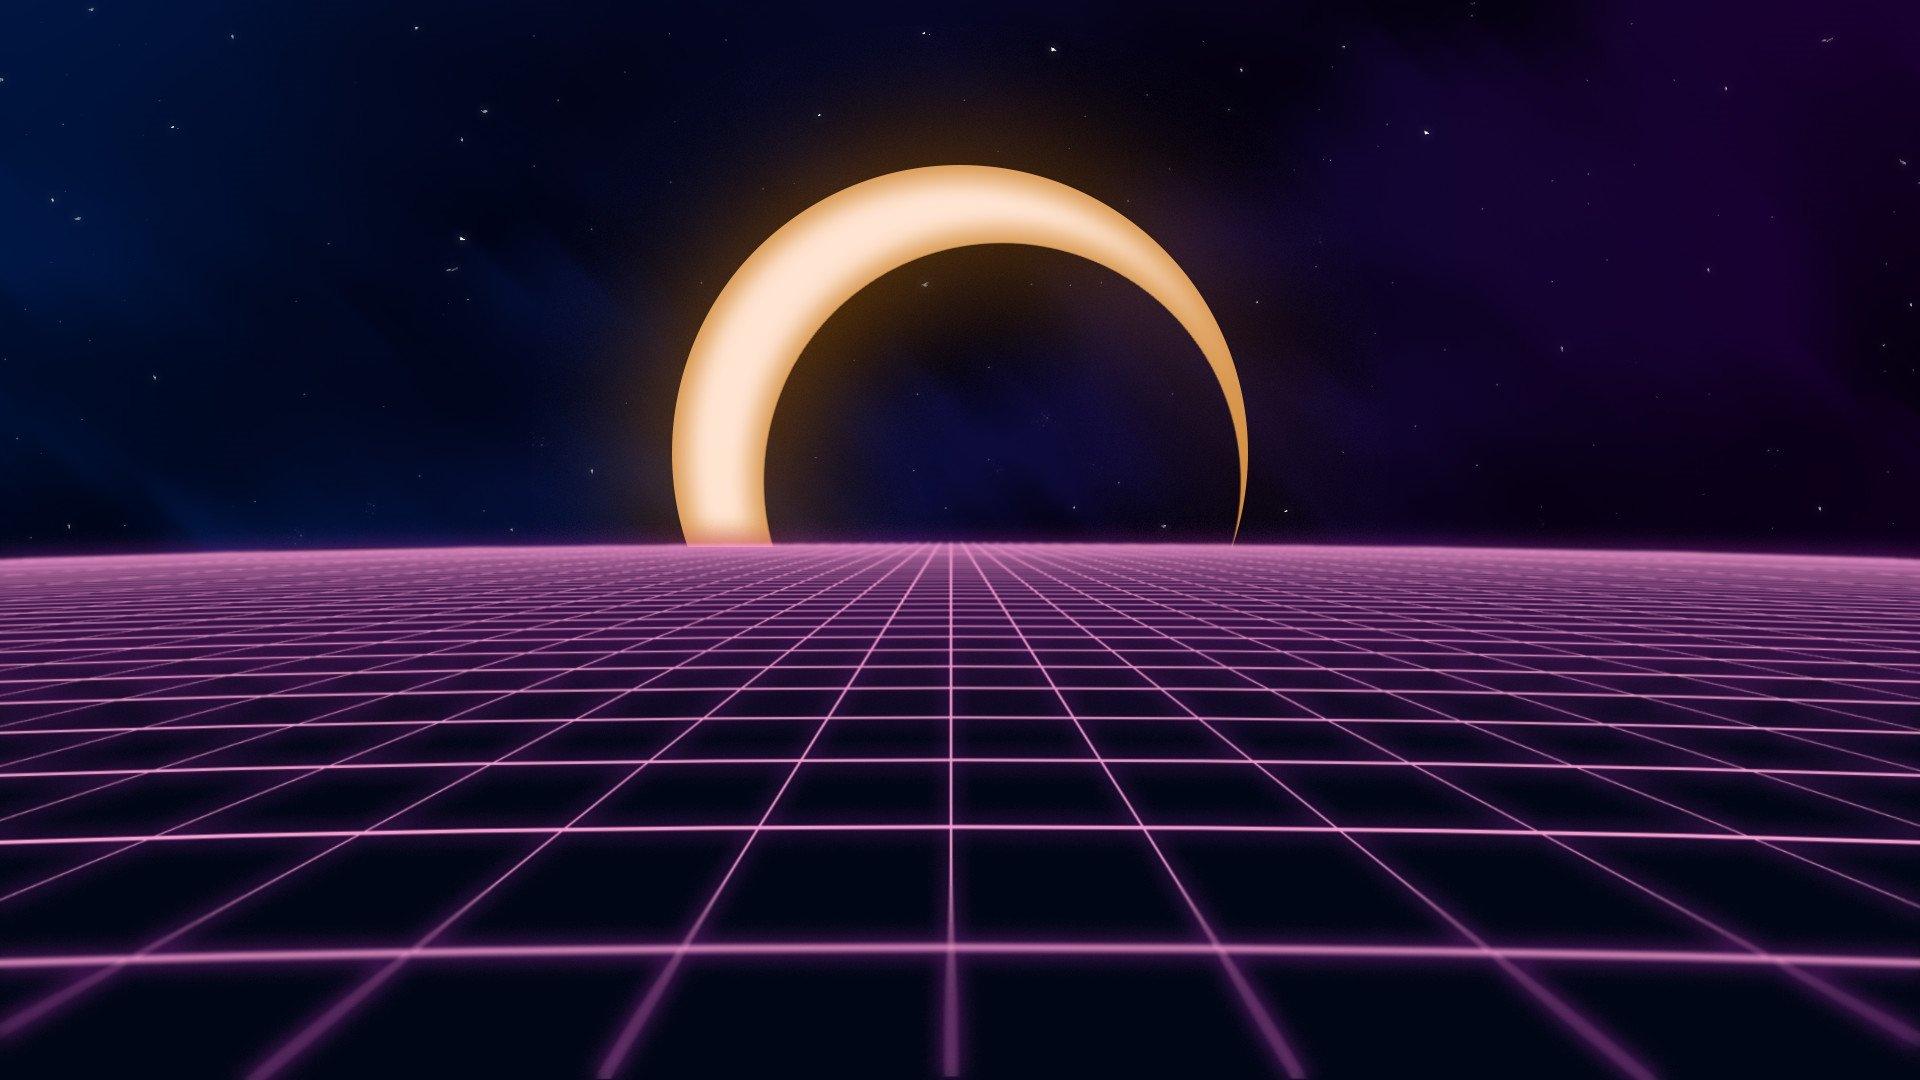 Aesthetic Moon Wallpaper Download Full